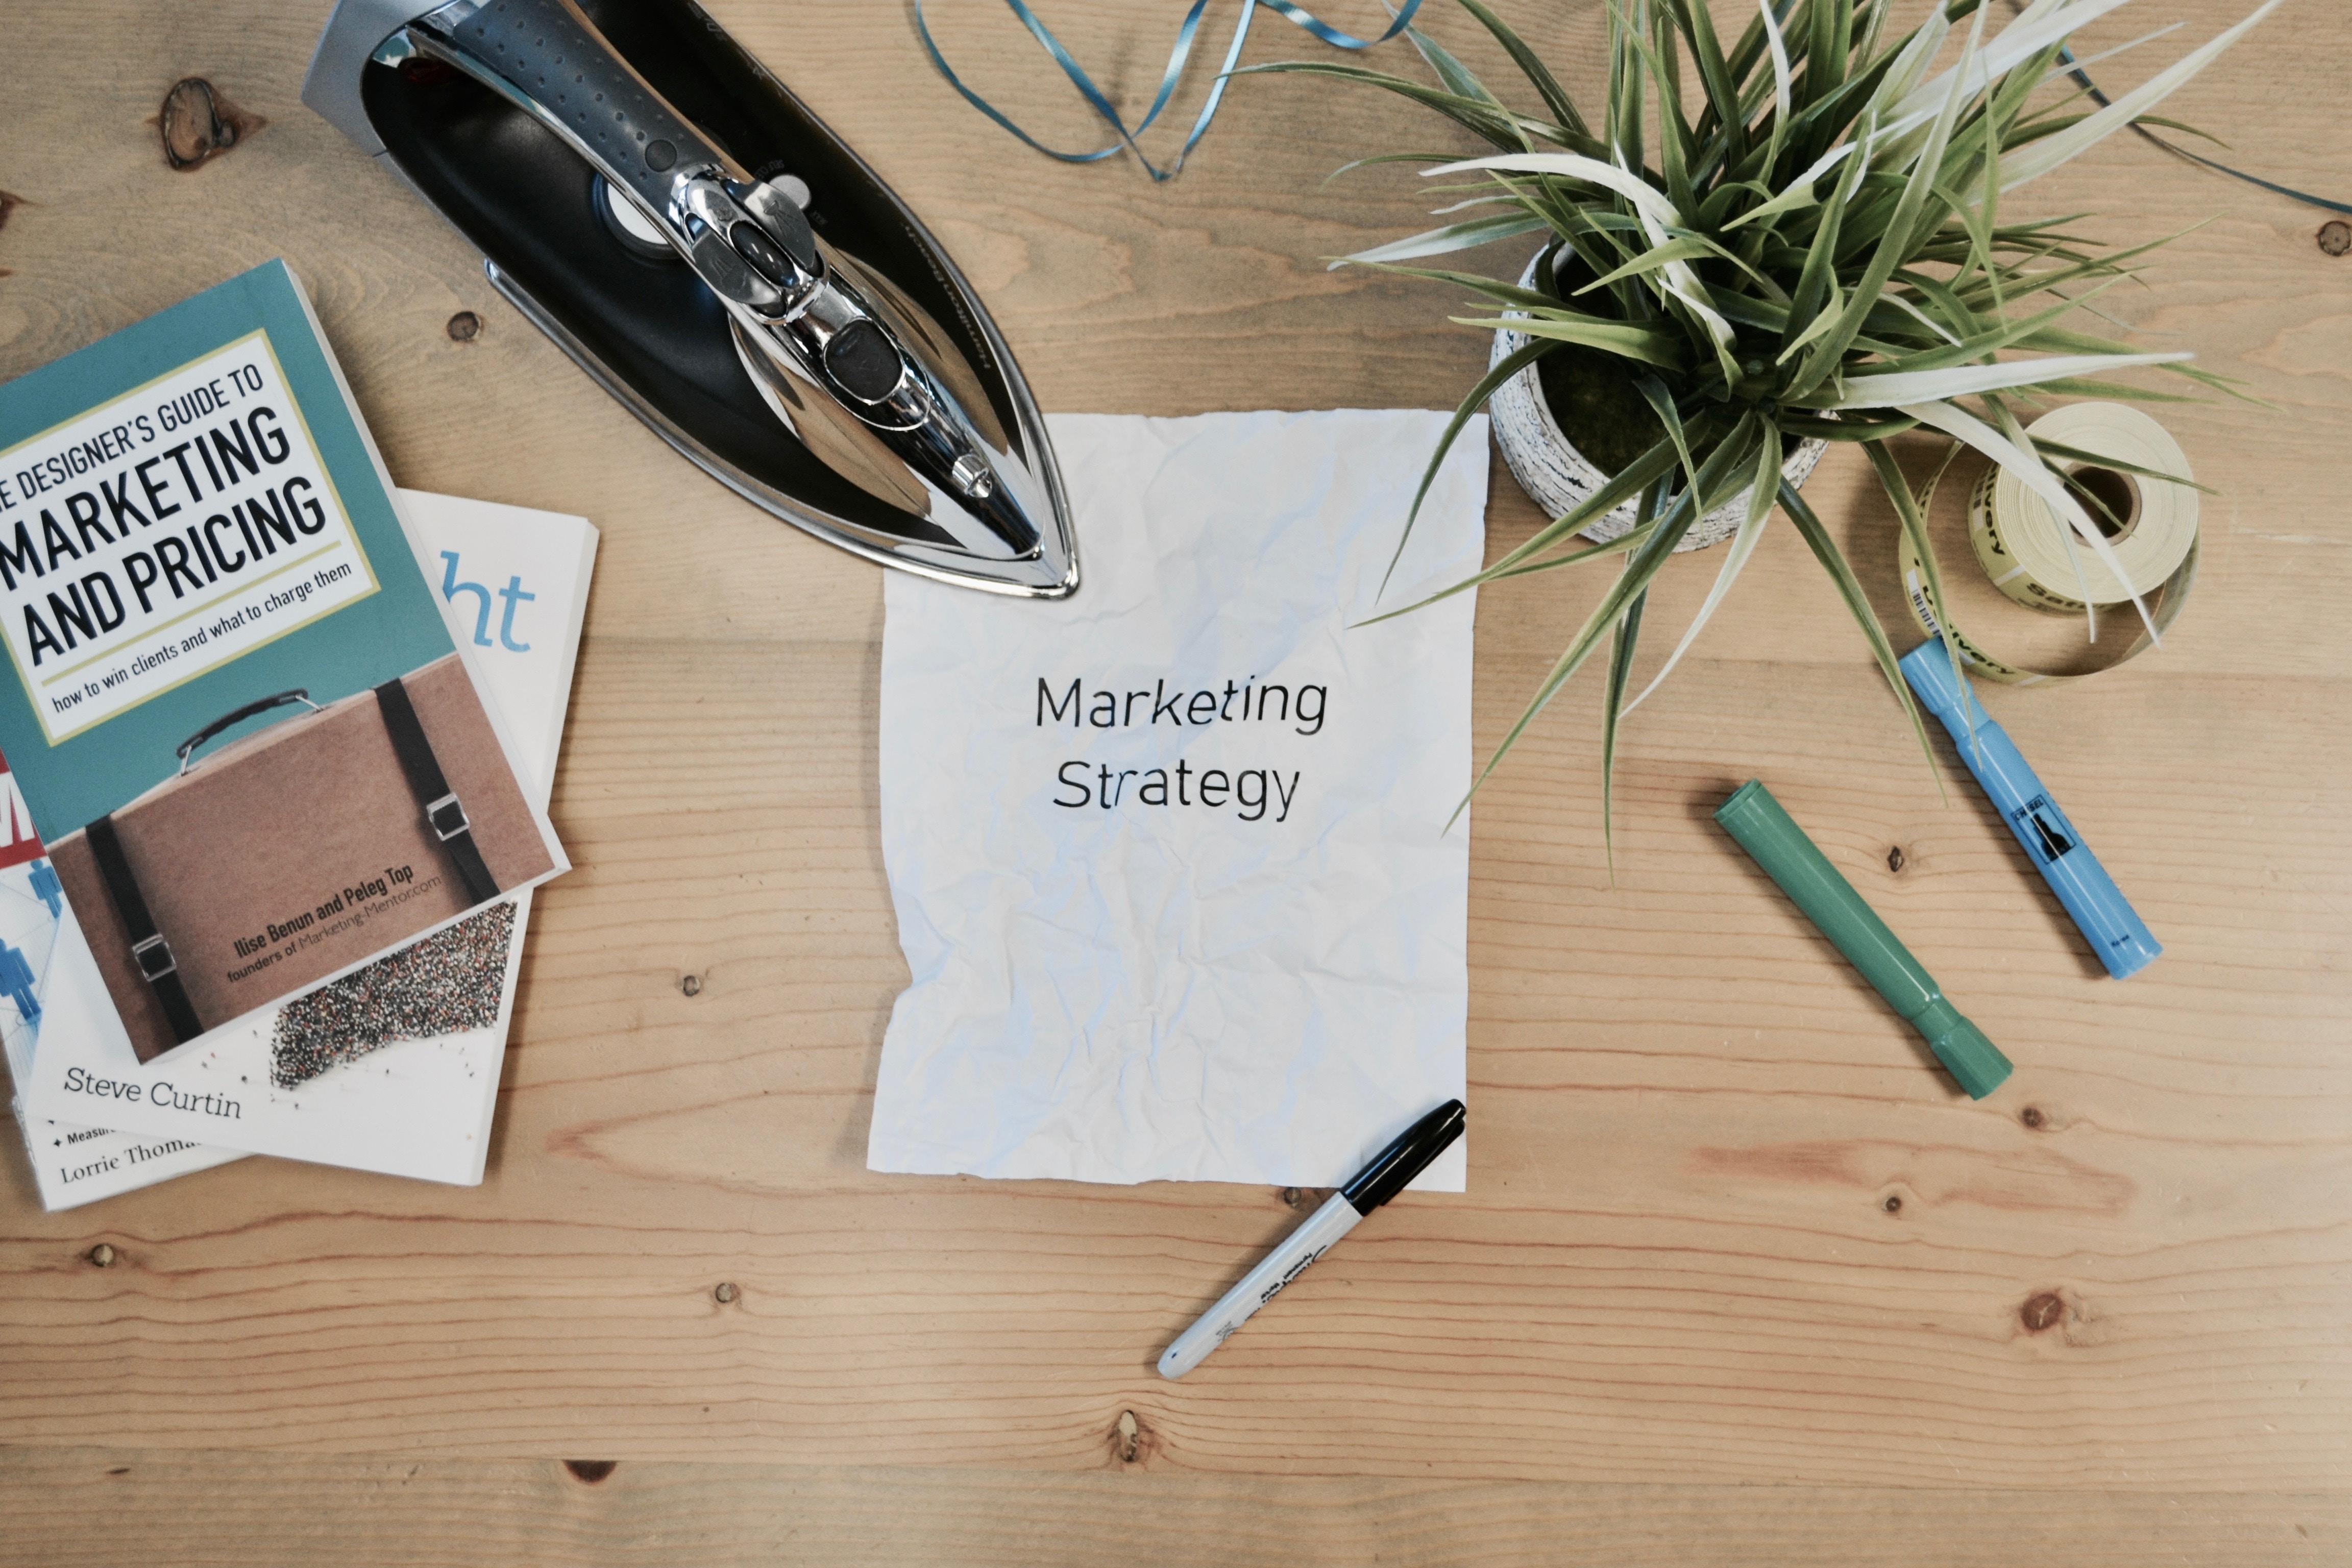 Choosing between an in-house team vs. external marketing team